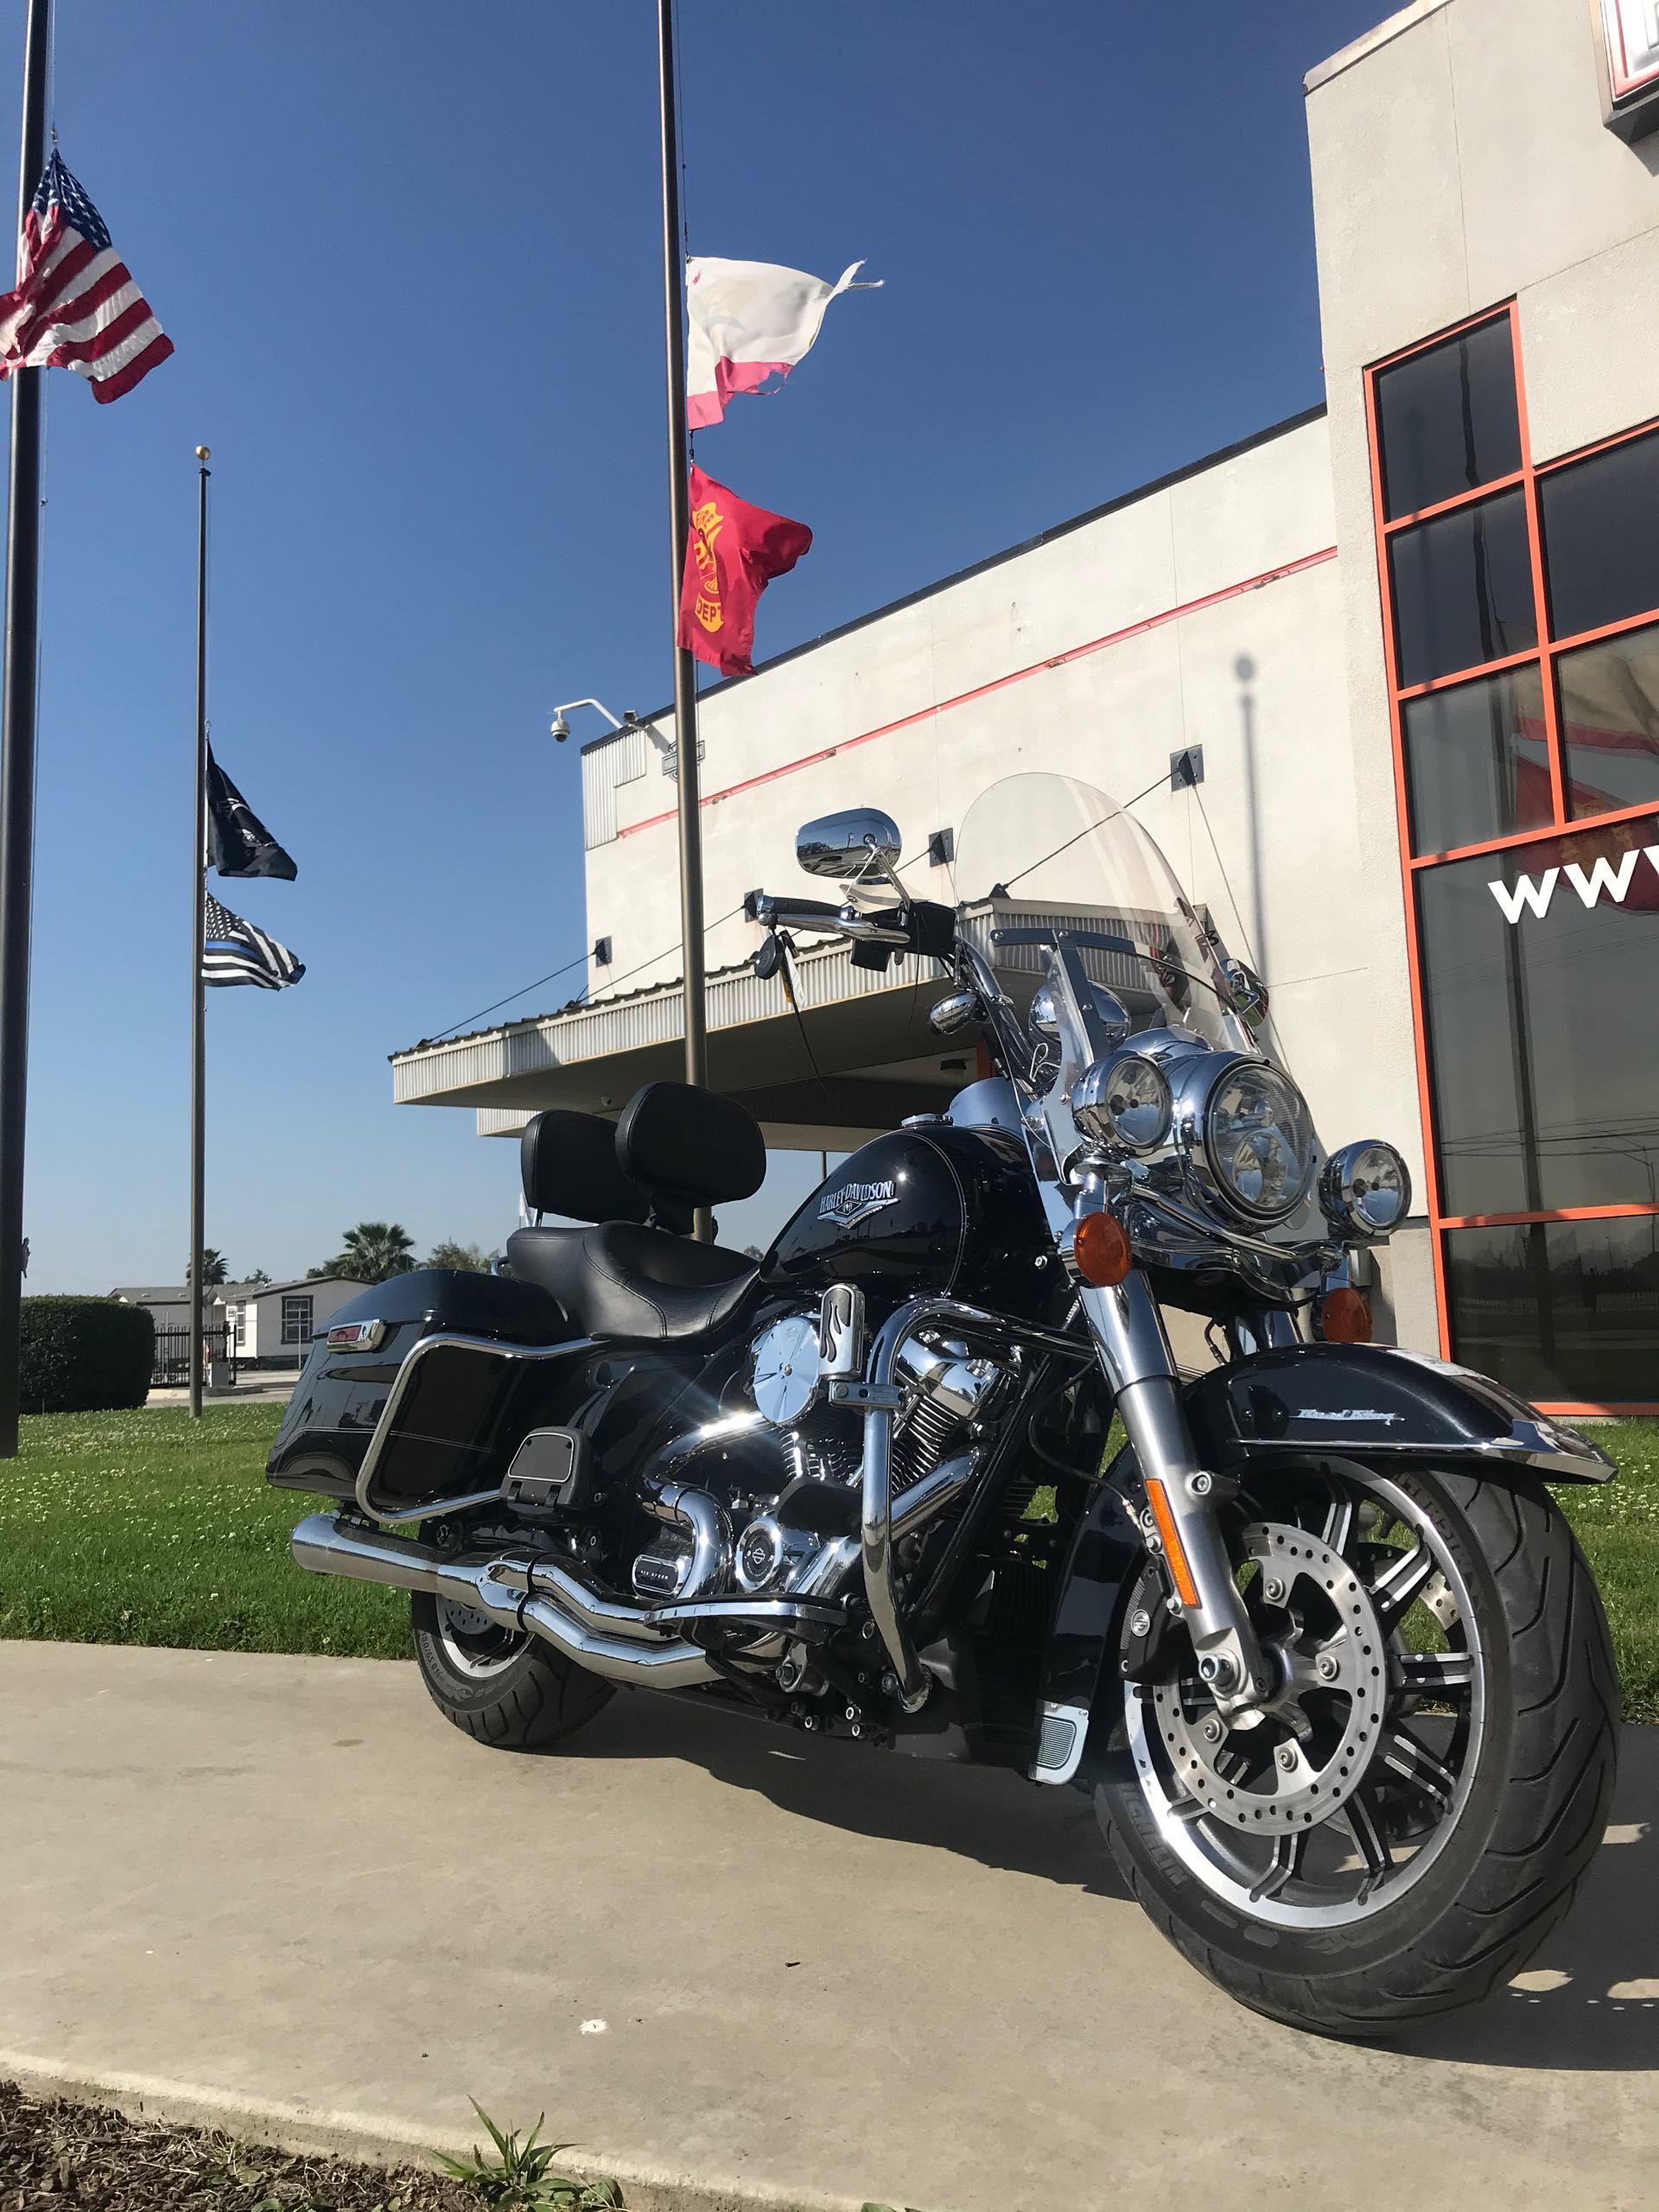 2017 Harley-Davidson Road King Base at Visalia Harley-Davidson